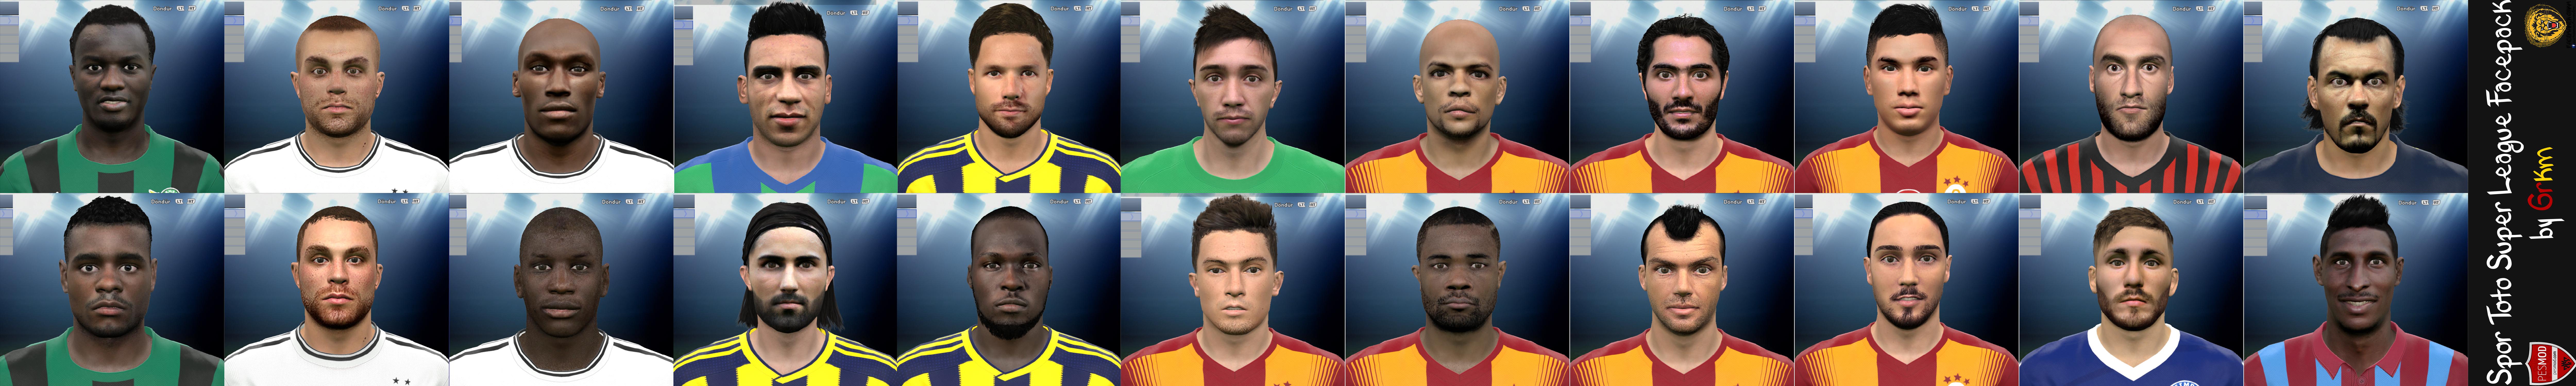 PES 2015 Spor Toto Süper Lig Facepack by Grkm